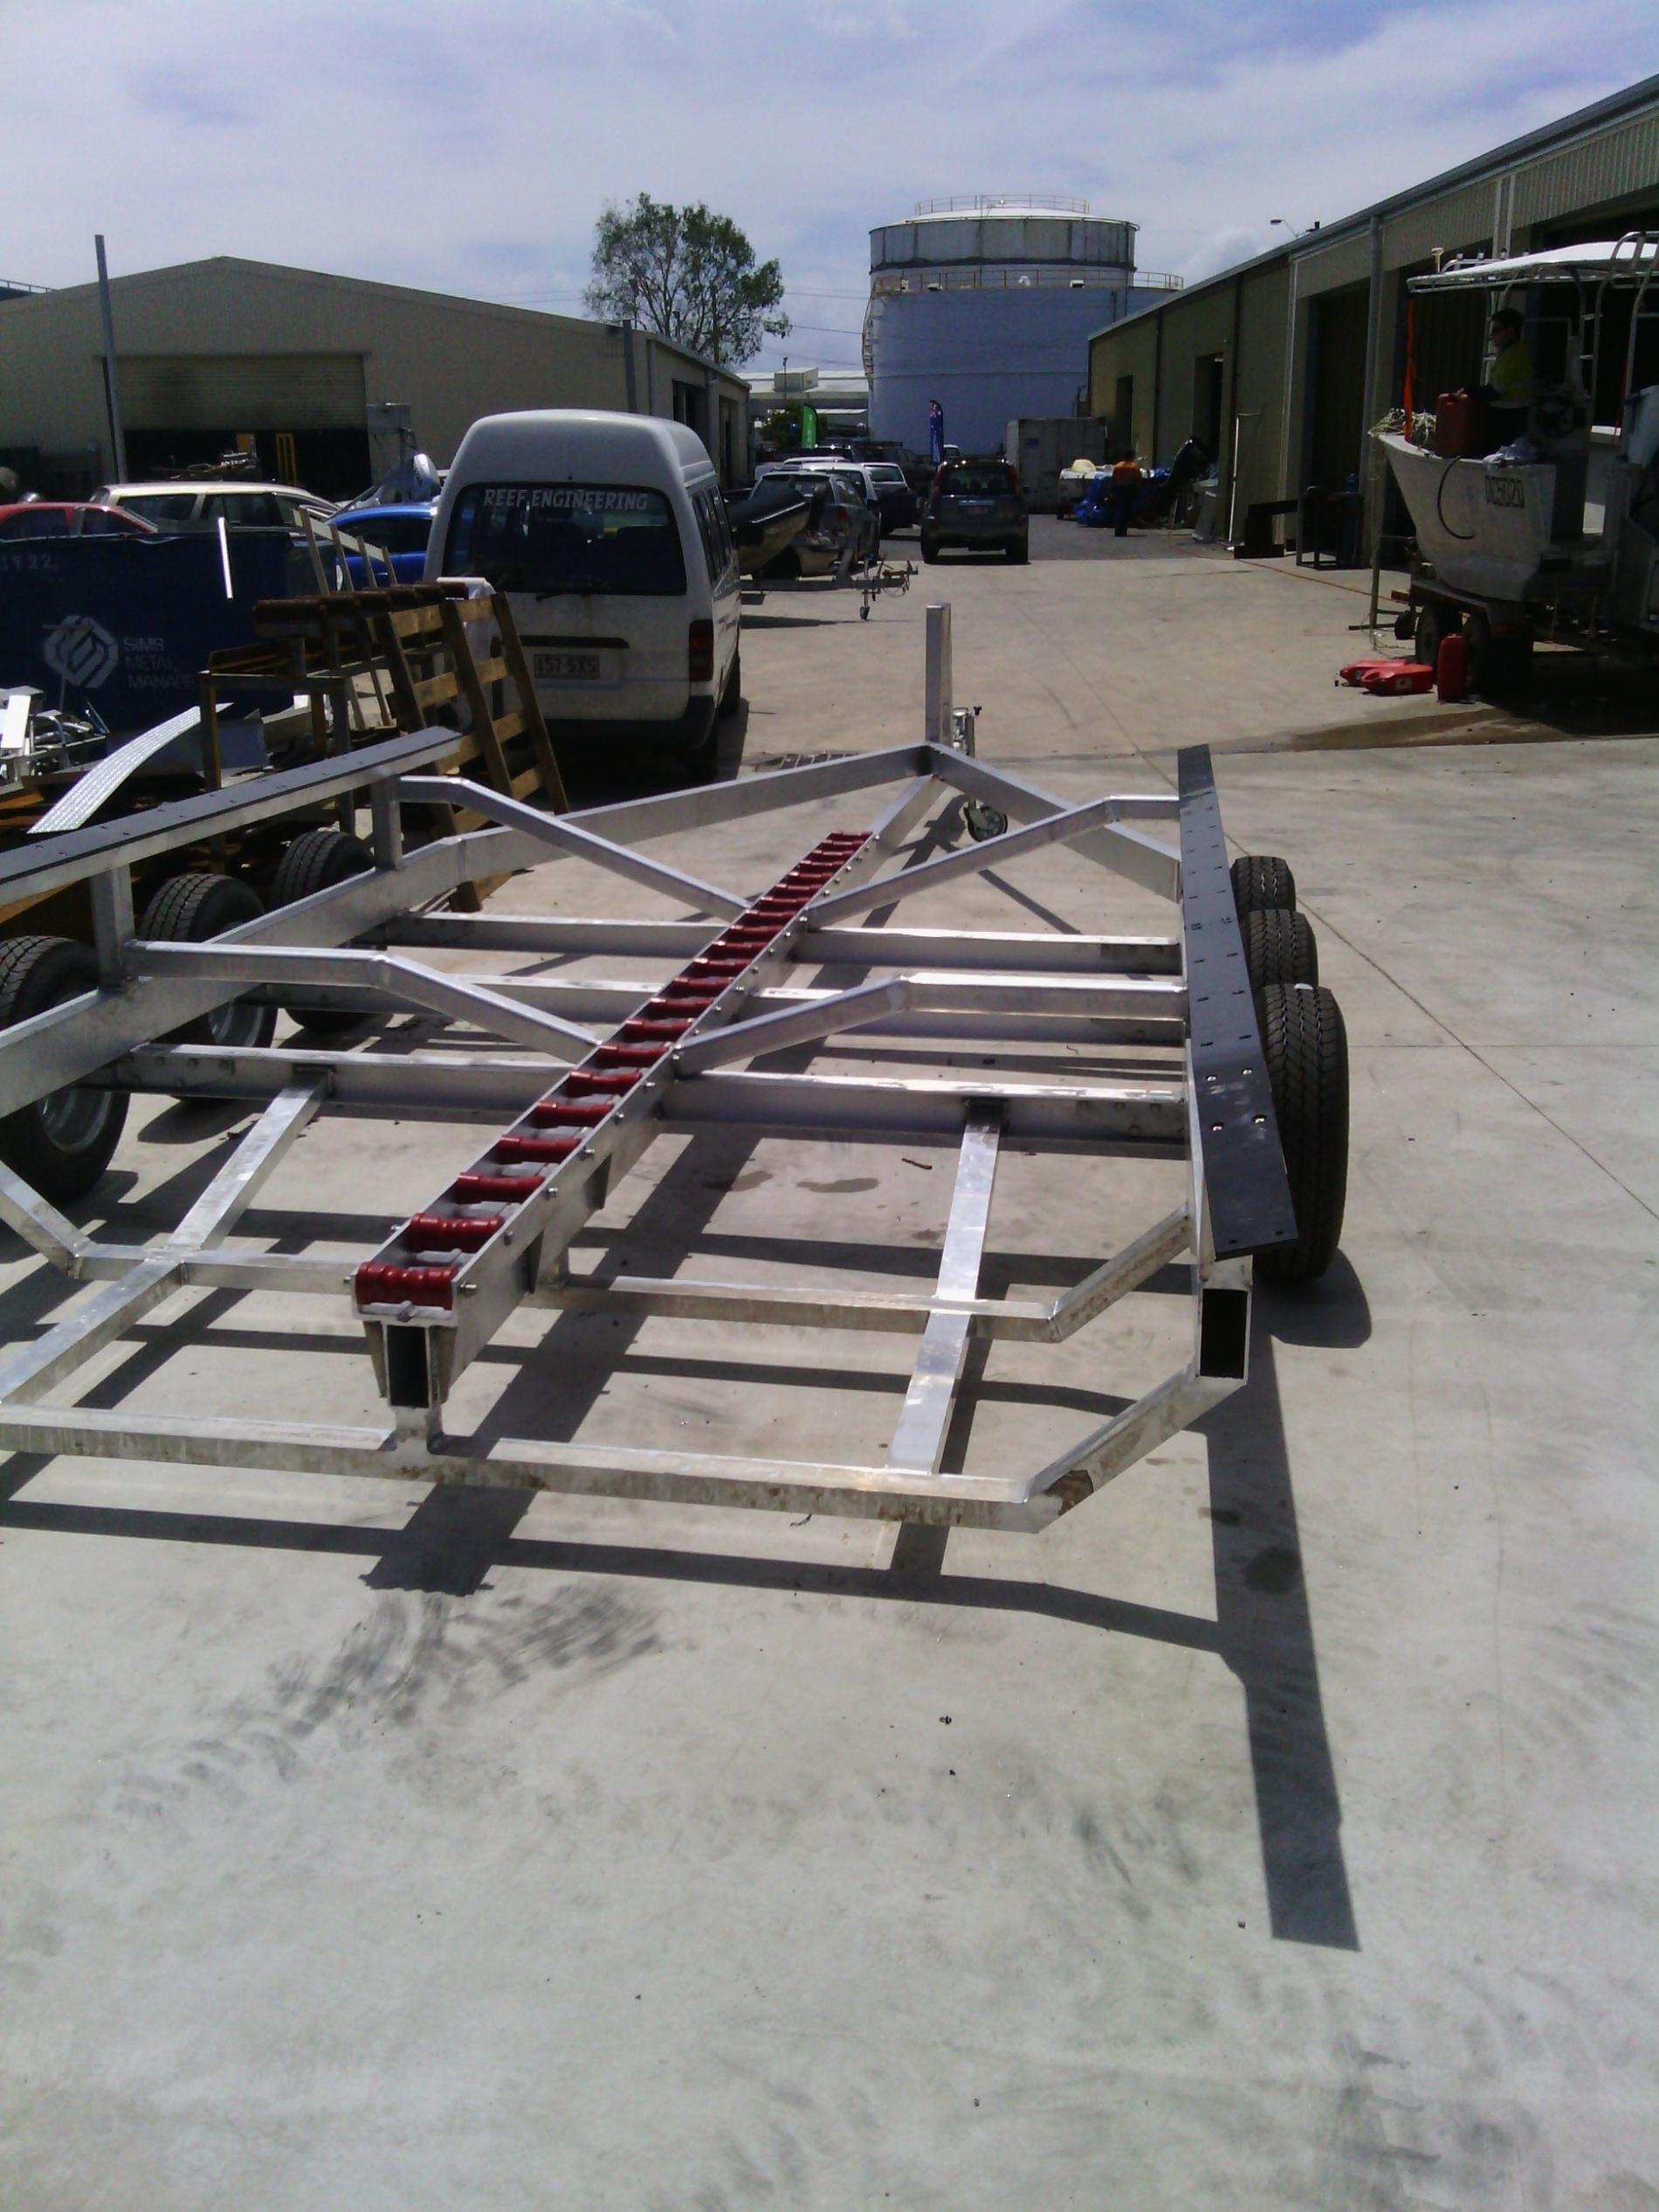 Plant trailers - Boat trailers - Box trailers - Camper